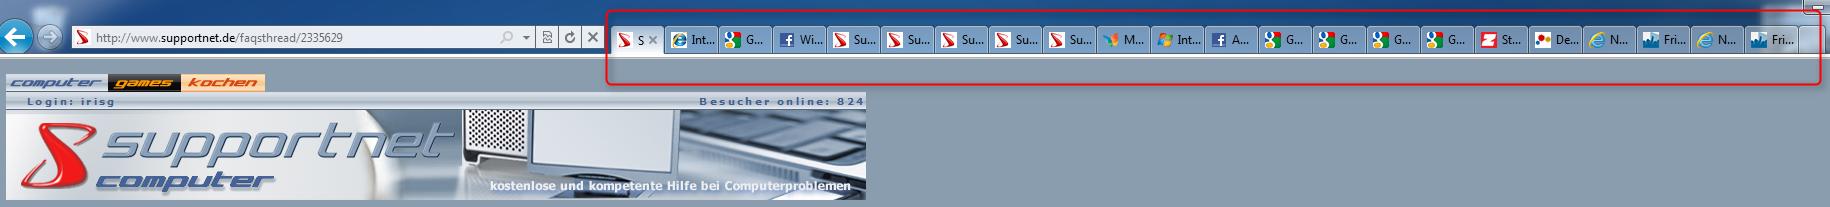 06-Die-neuen-Browser-Internet-Explorer-9-Beta-Screenshot-viele-Registerkarten-470.png